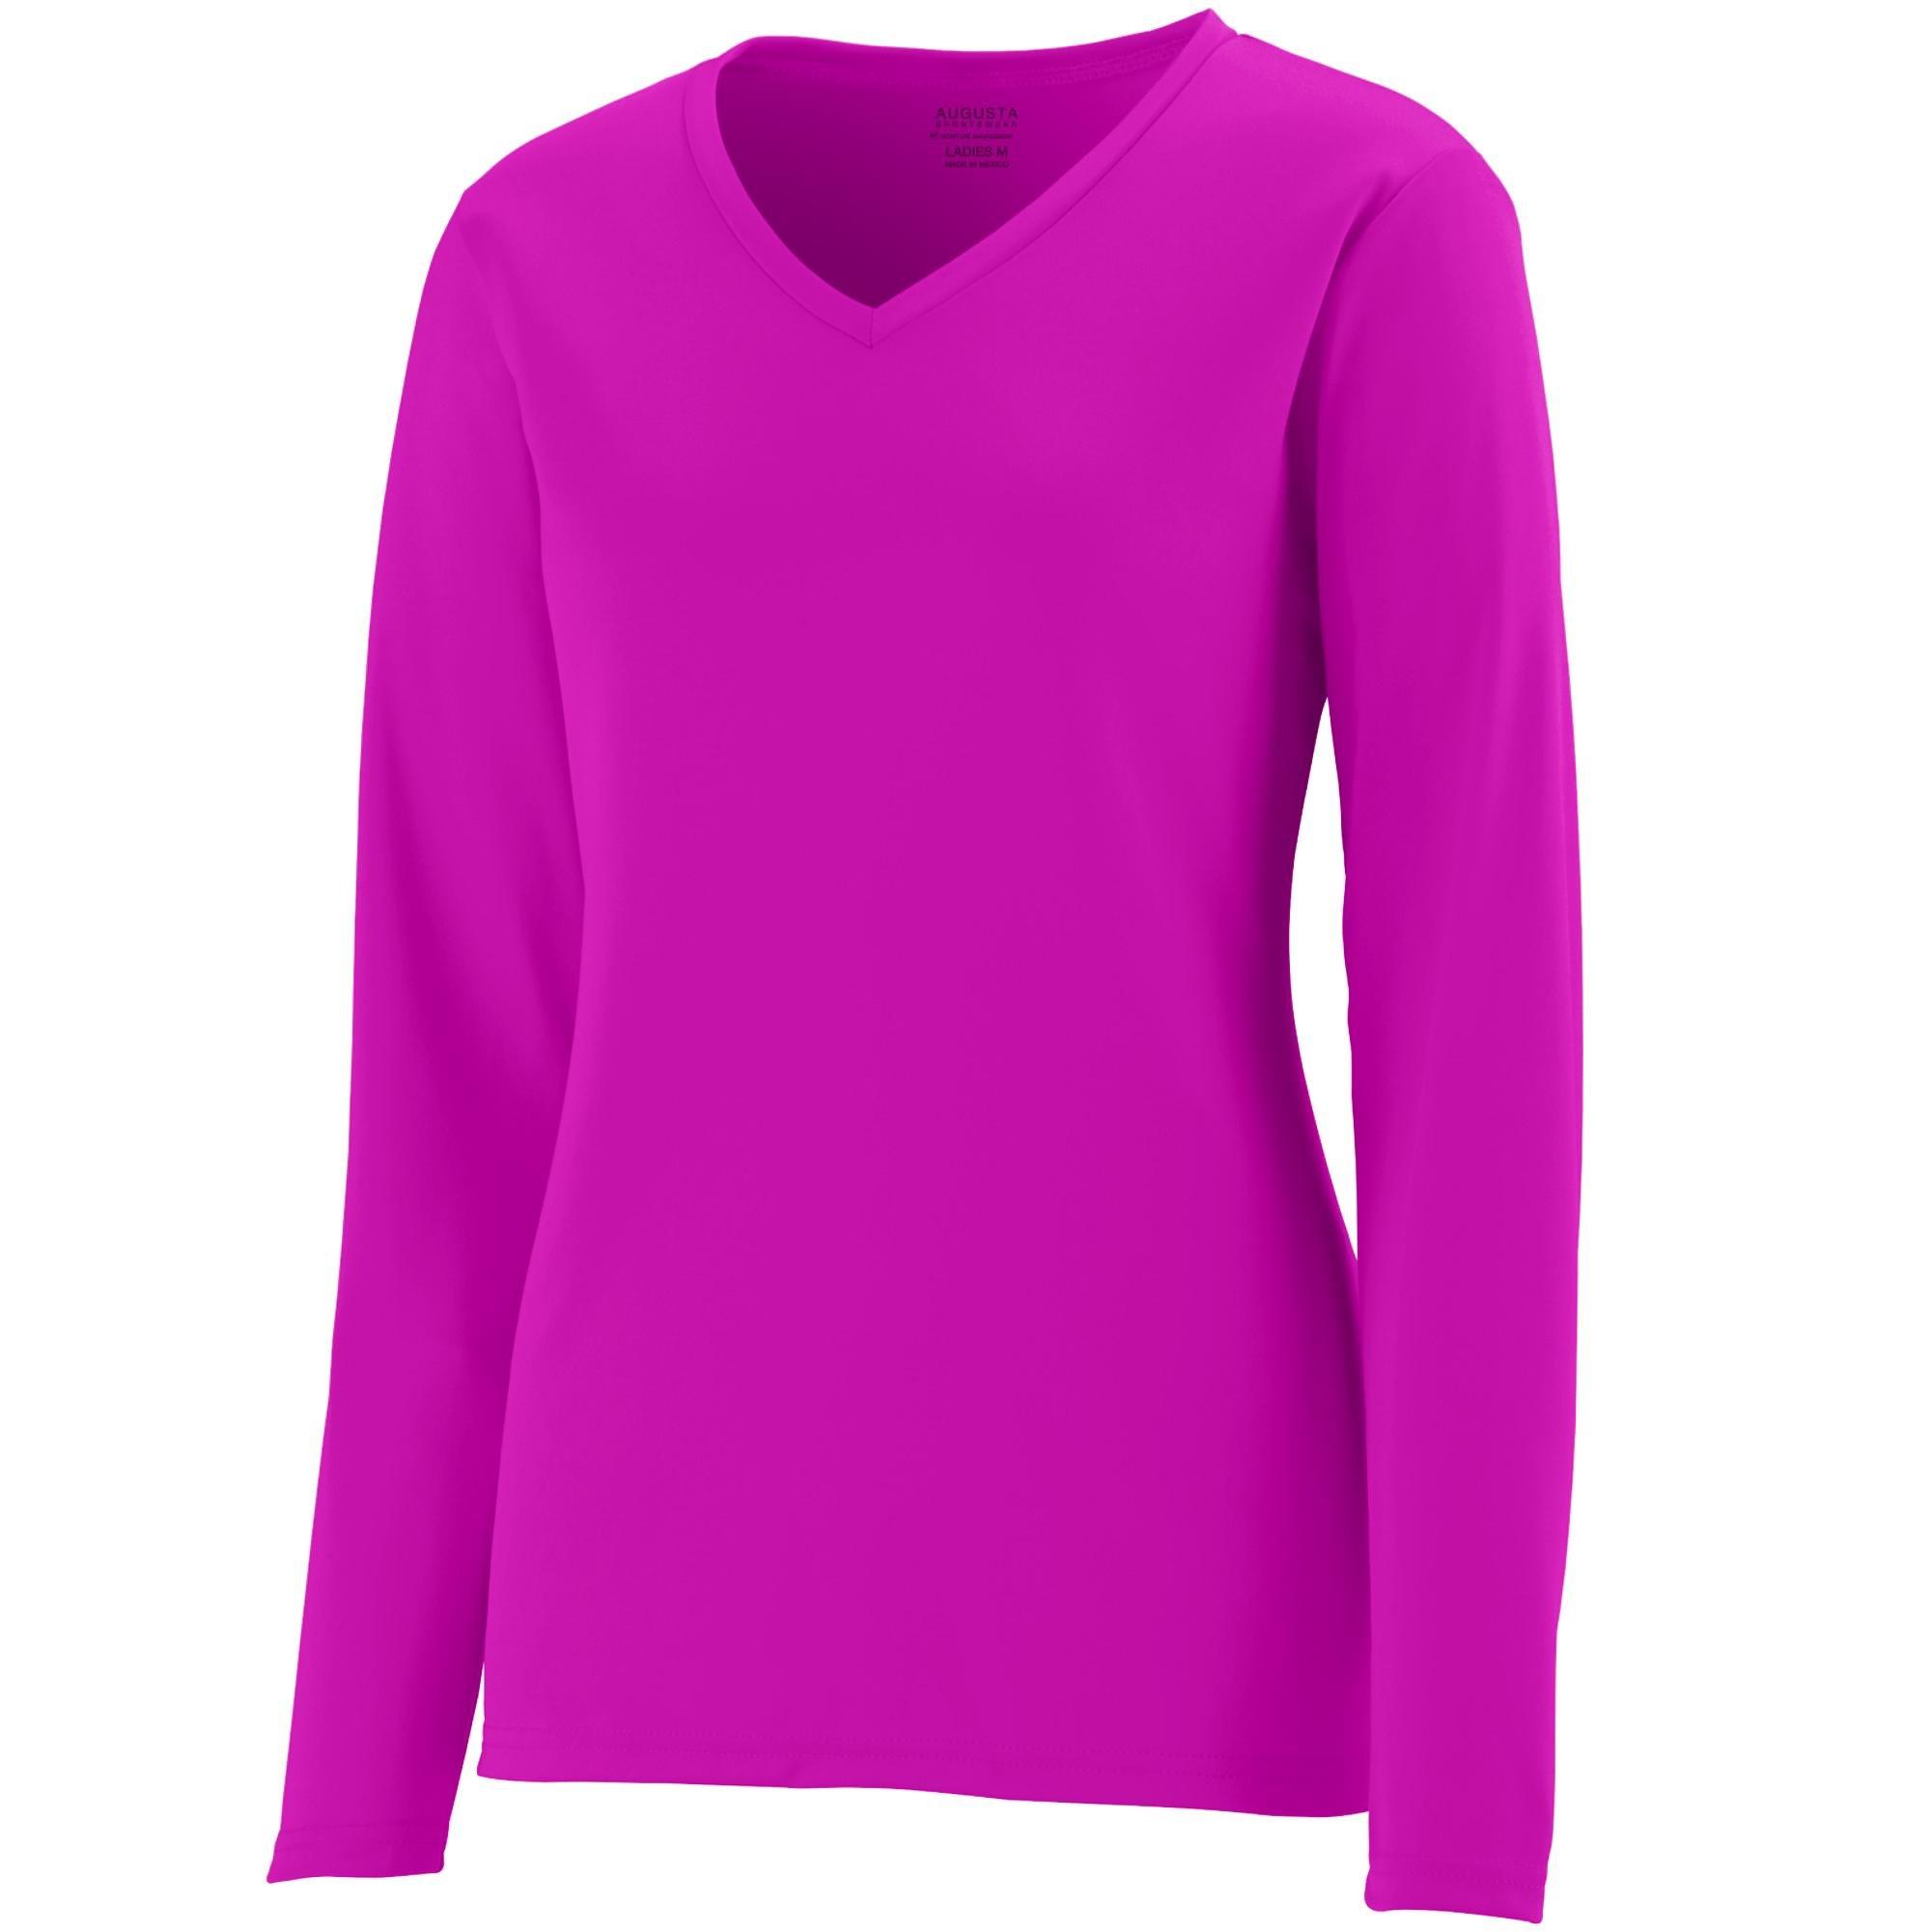 Augusta Sportswear Womens Long Sleeve Wicking T-Shirt, Power Pink, 3X-Large